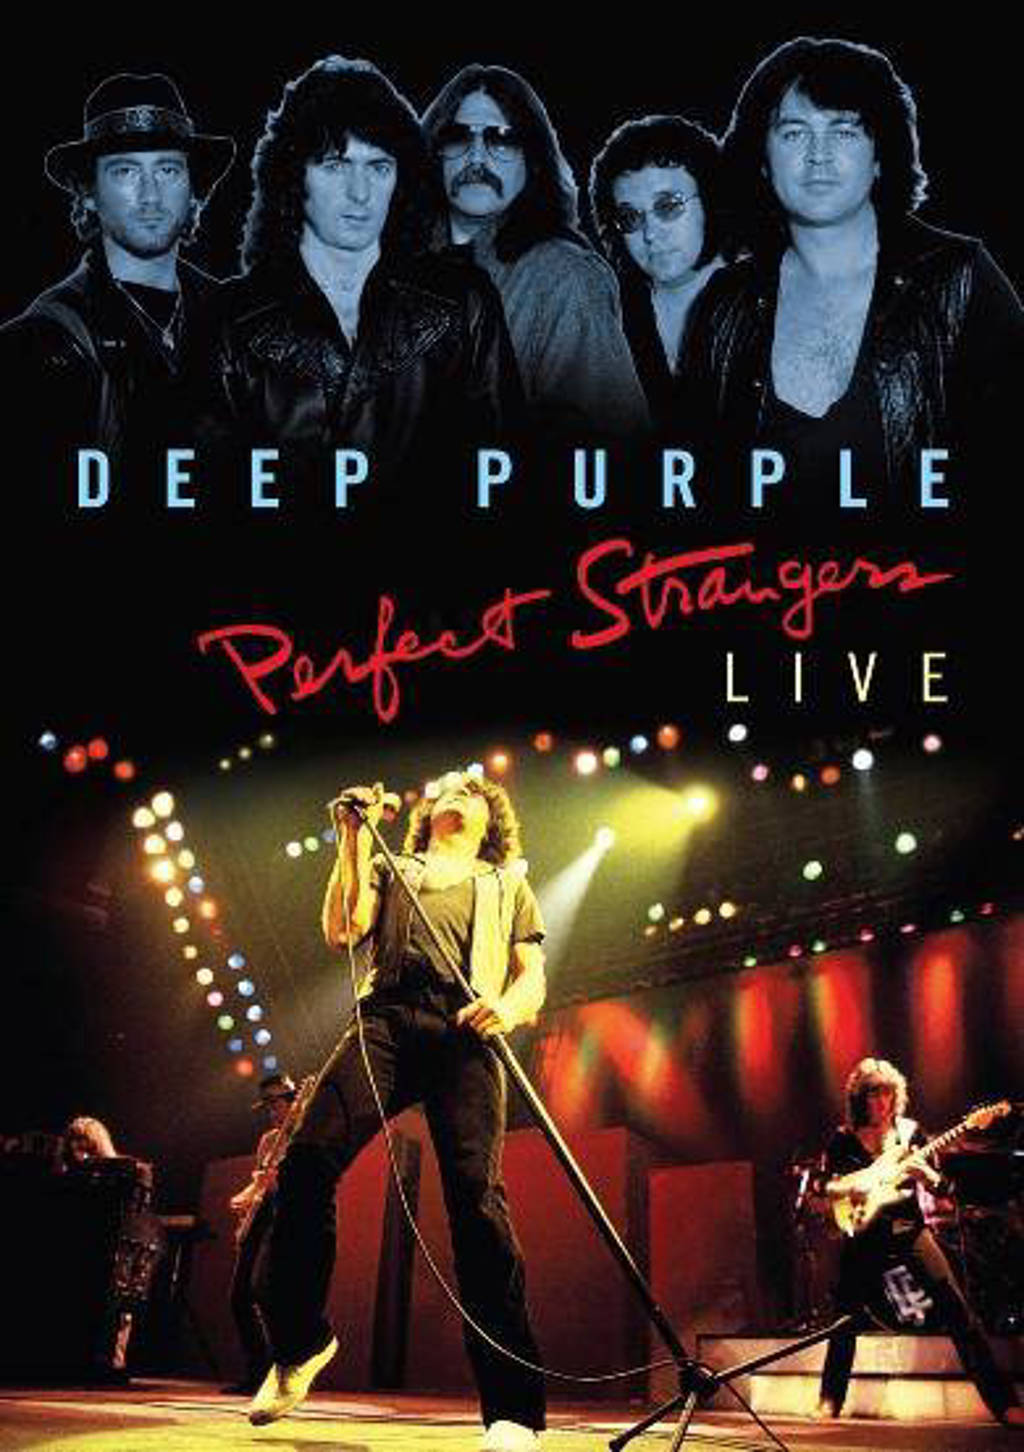 Deep Purple - Perfect Strangers - Live (DVD)